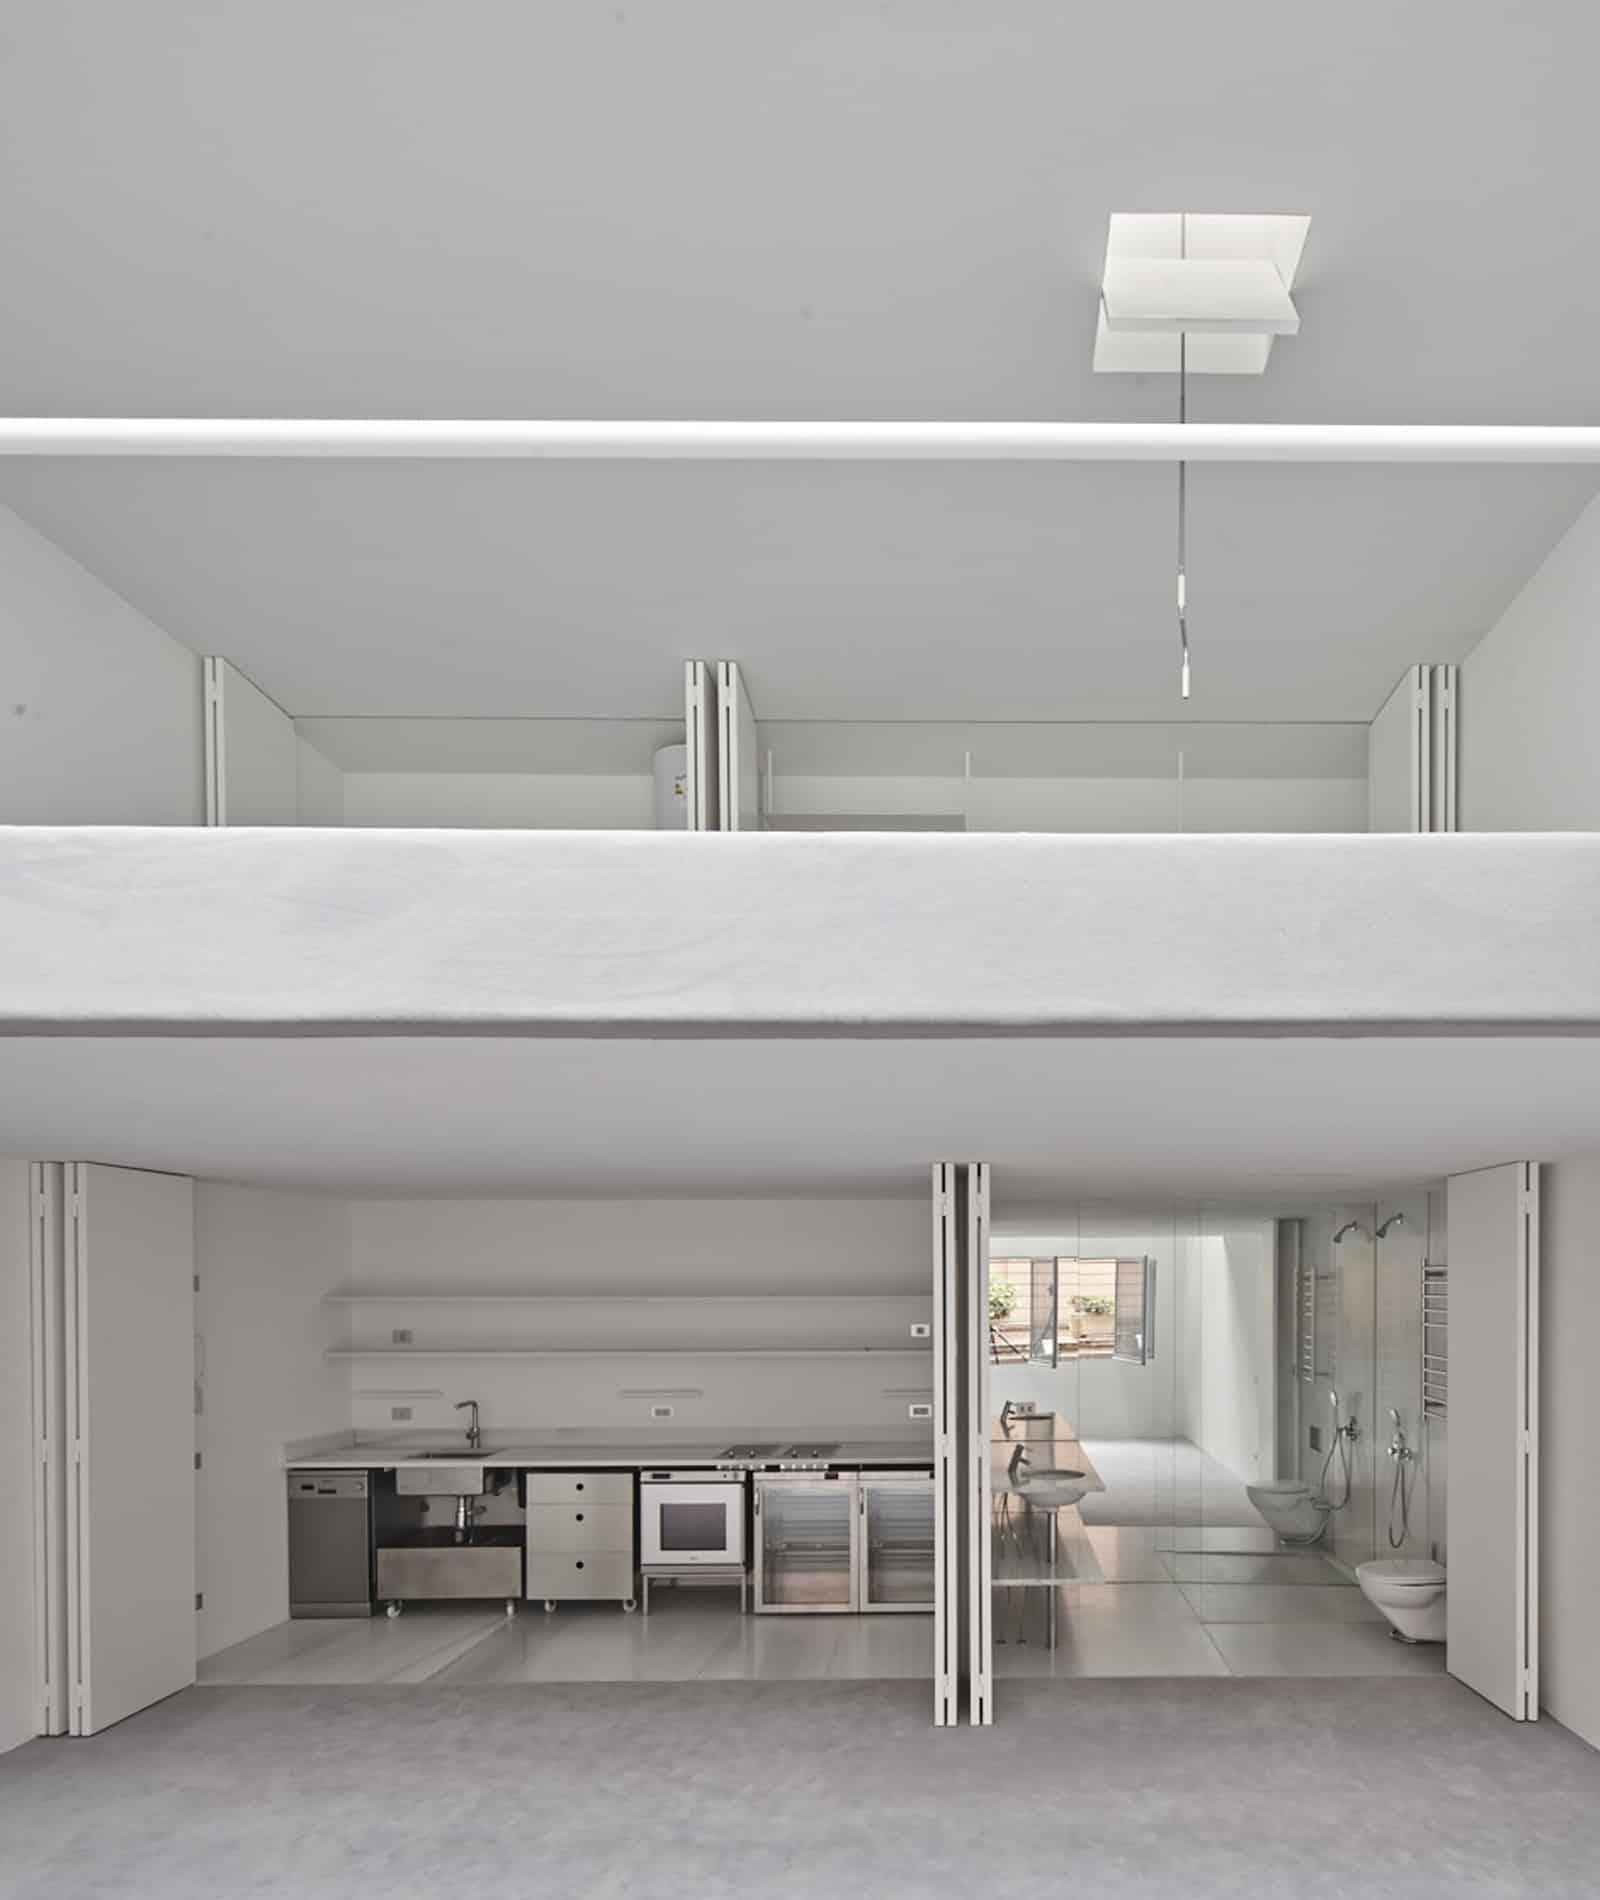 Casa Omar  - 01 ArquitecturaG CasaOmar 1 31